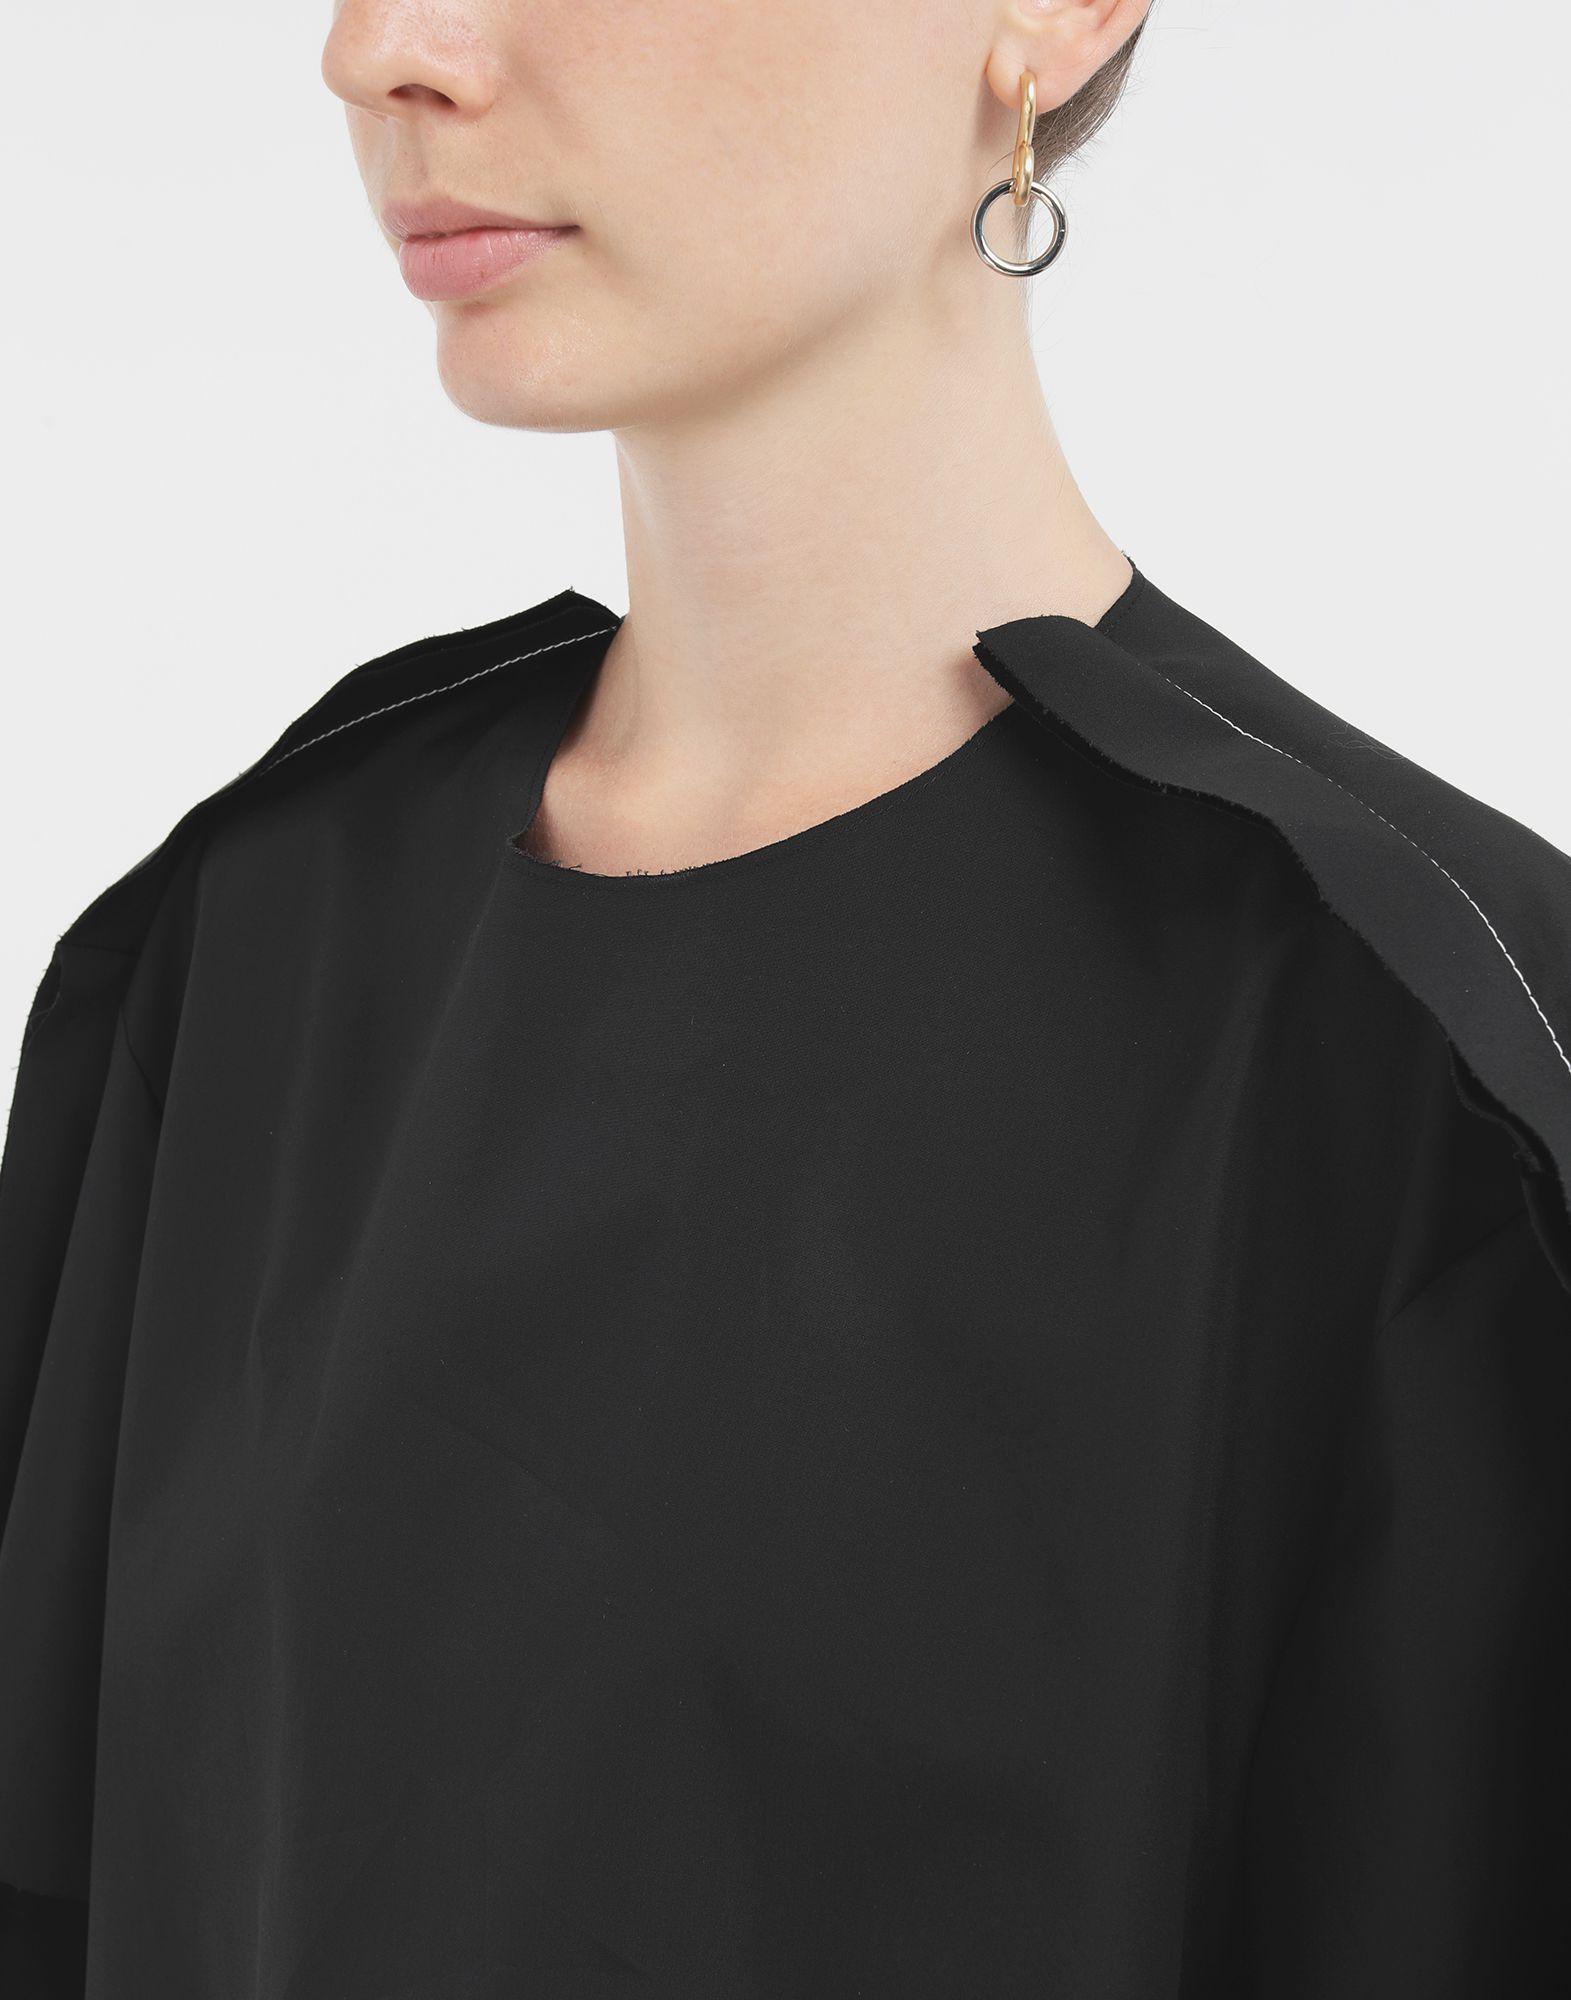 MAISON MARGIELA Pendant earrings Earrings Woman r